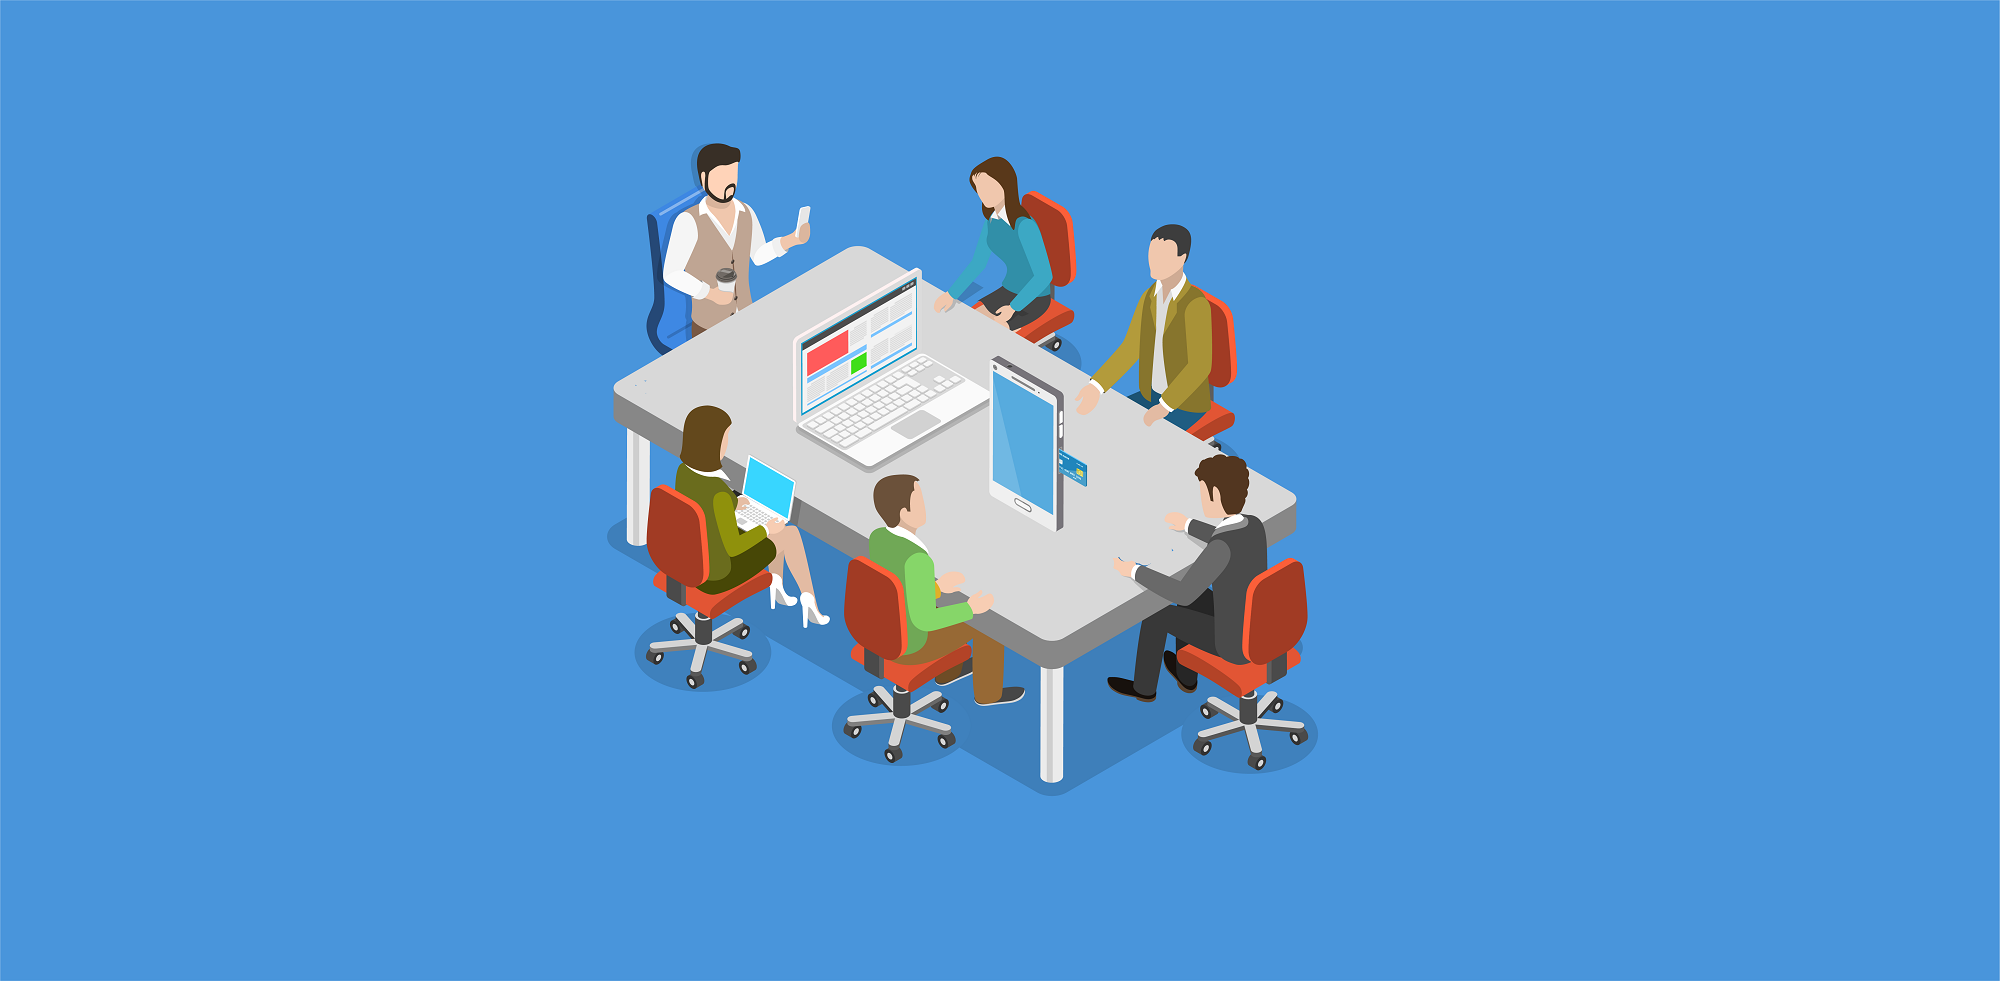 Customer Experience & Digital Transformation